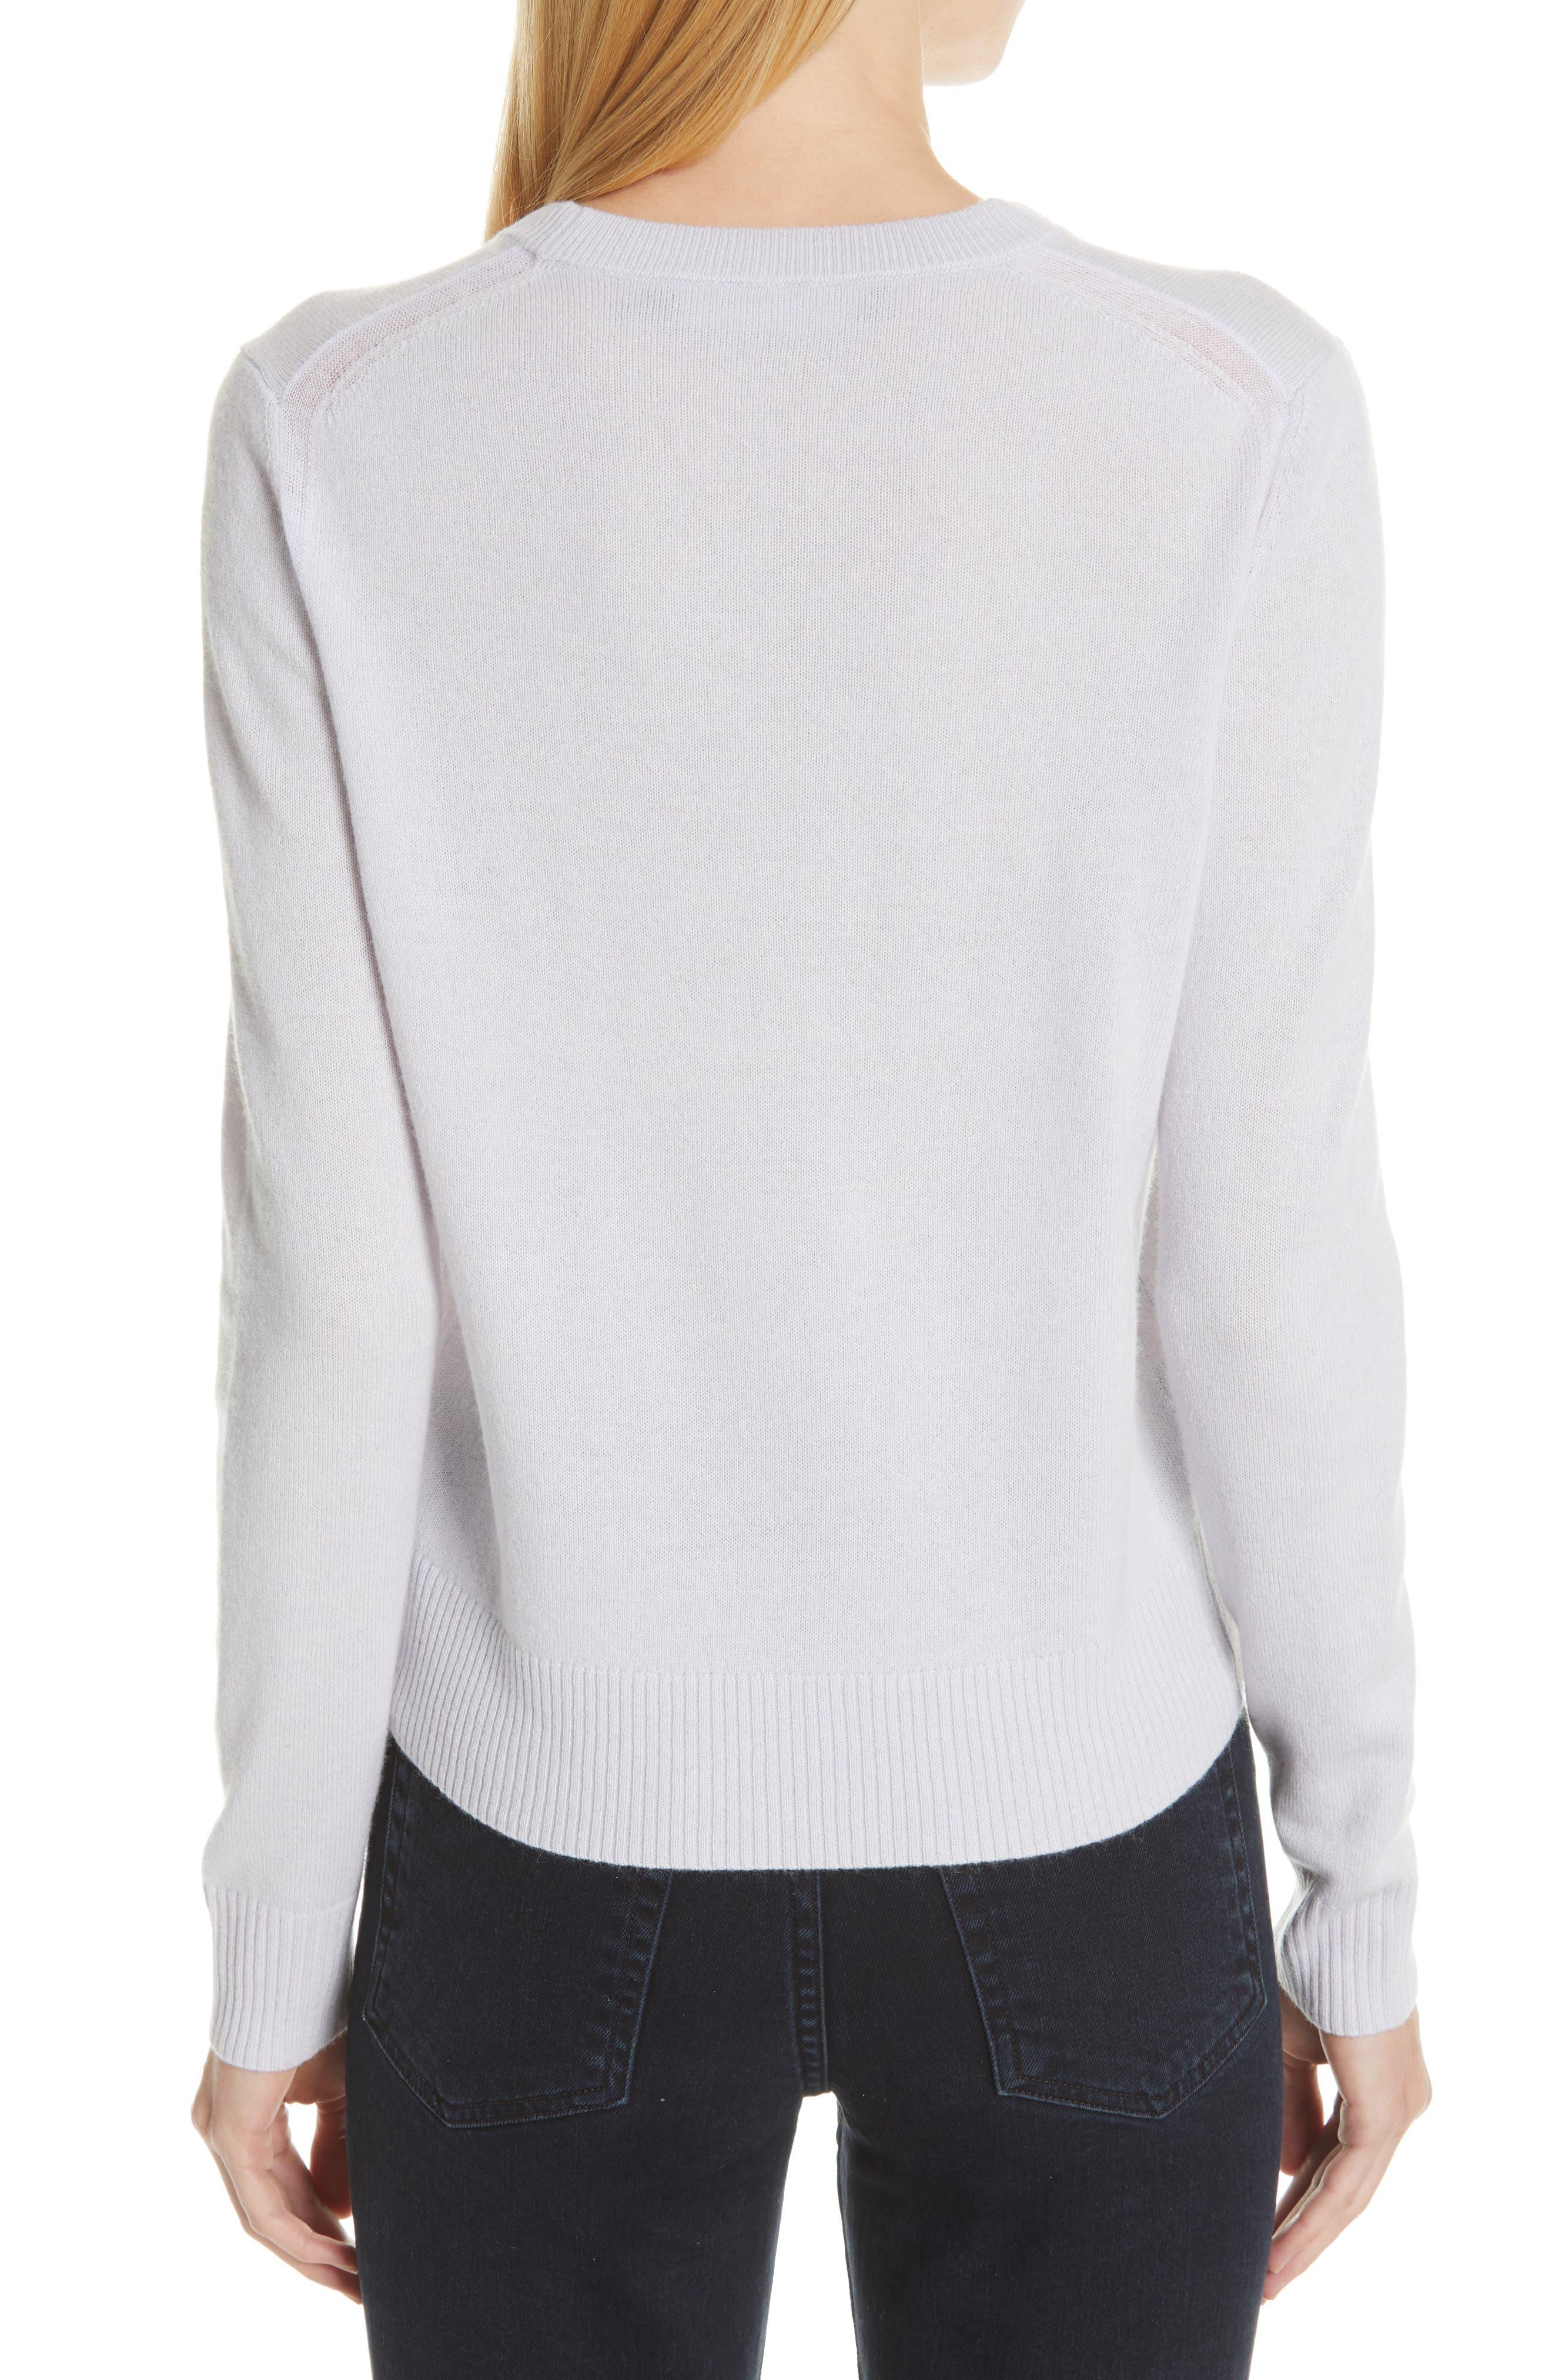 PROENZA SCHOULER, Cashmere Sweater, Alternate thumbnail 2, color, BLUE GREY